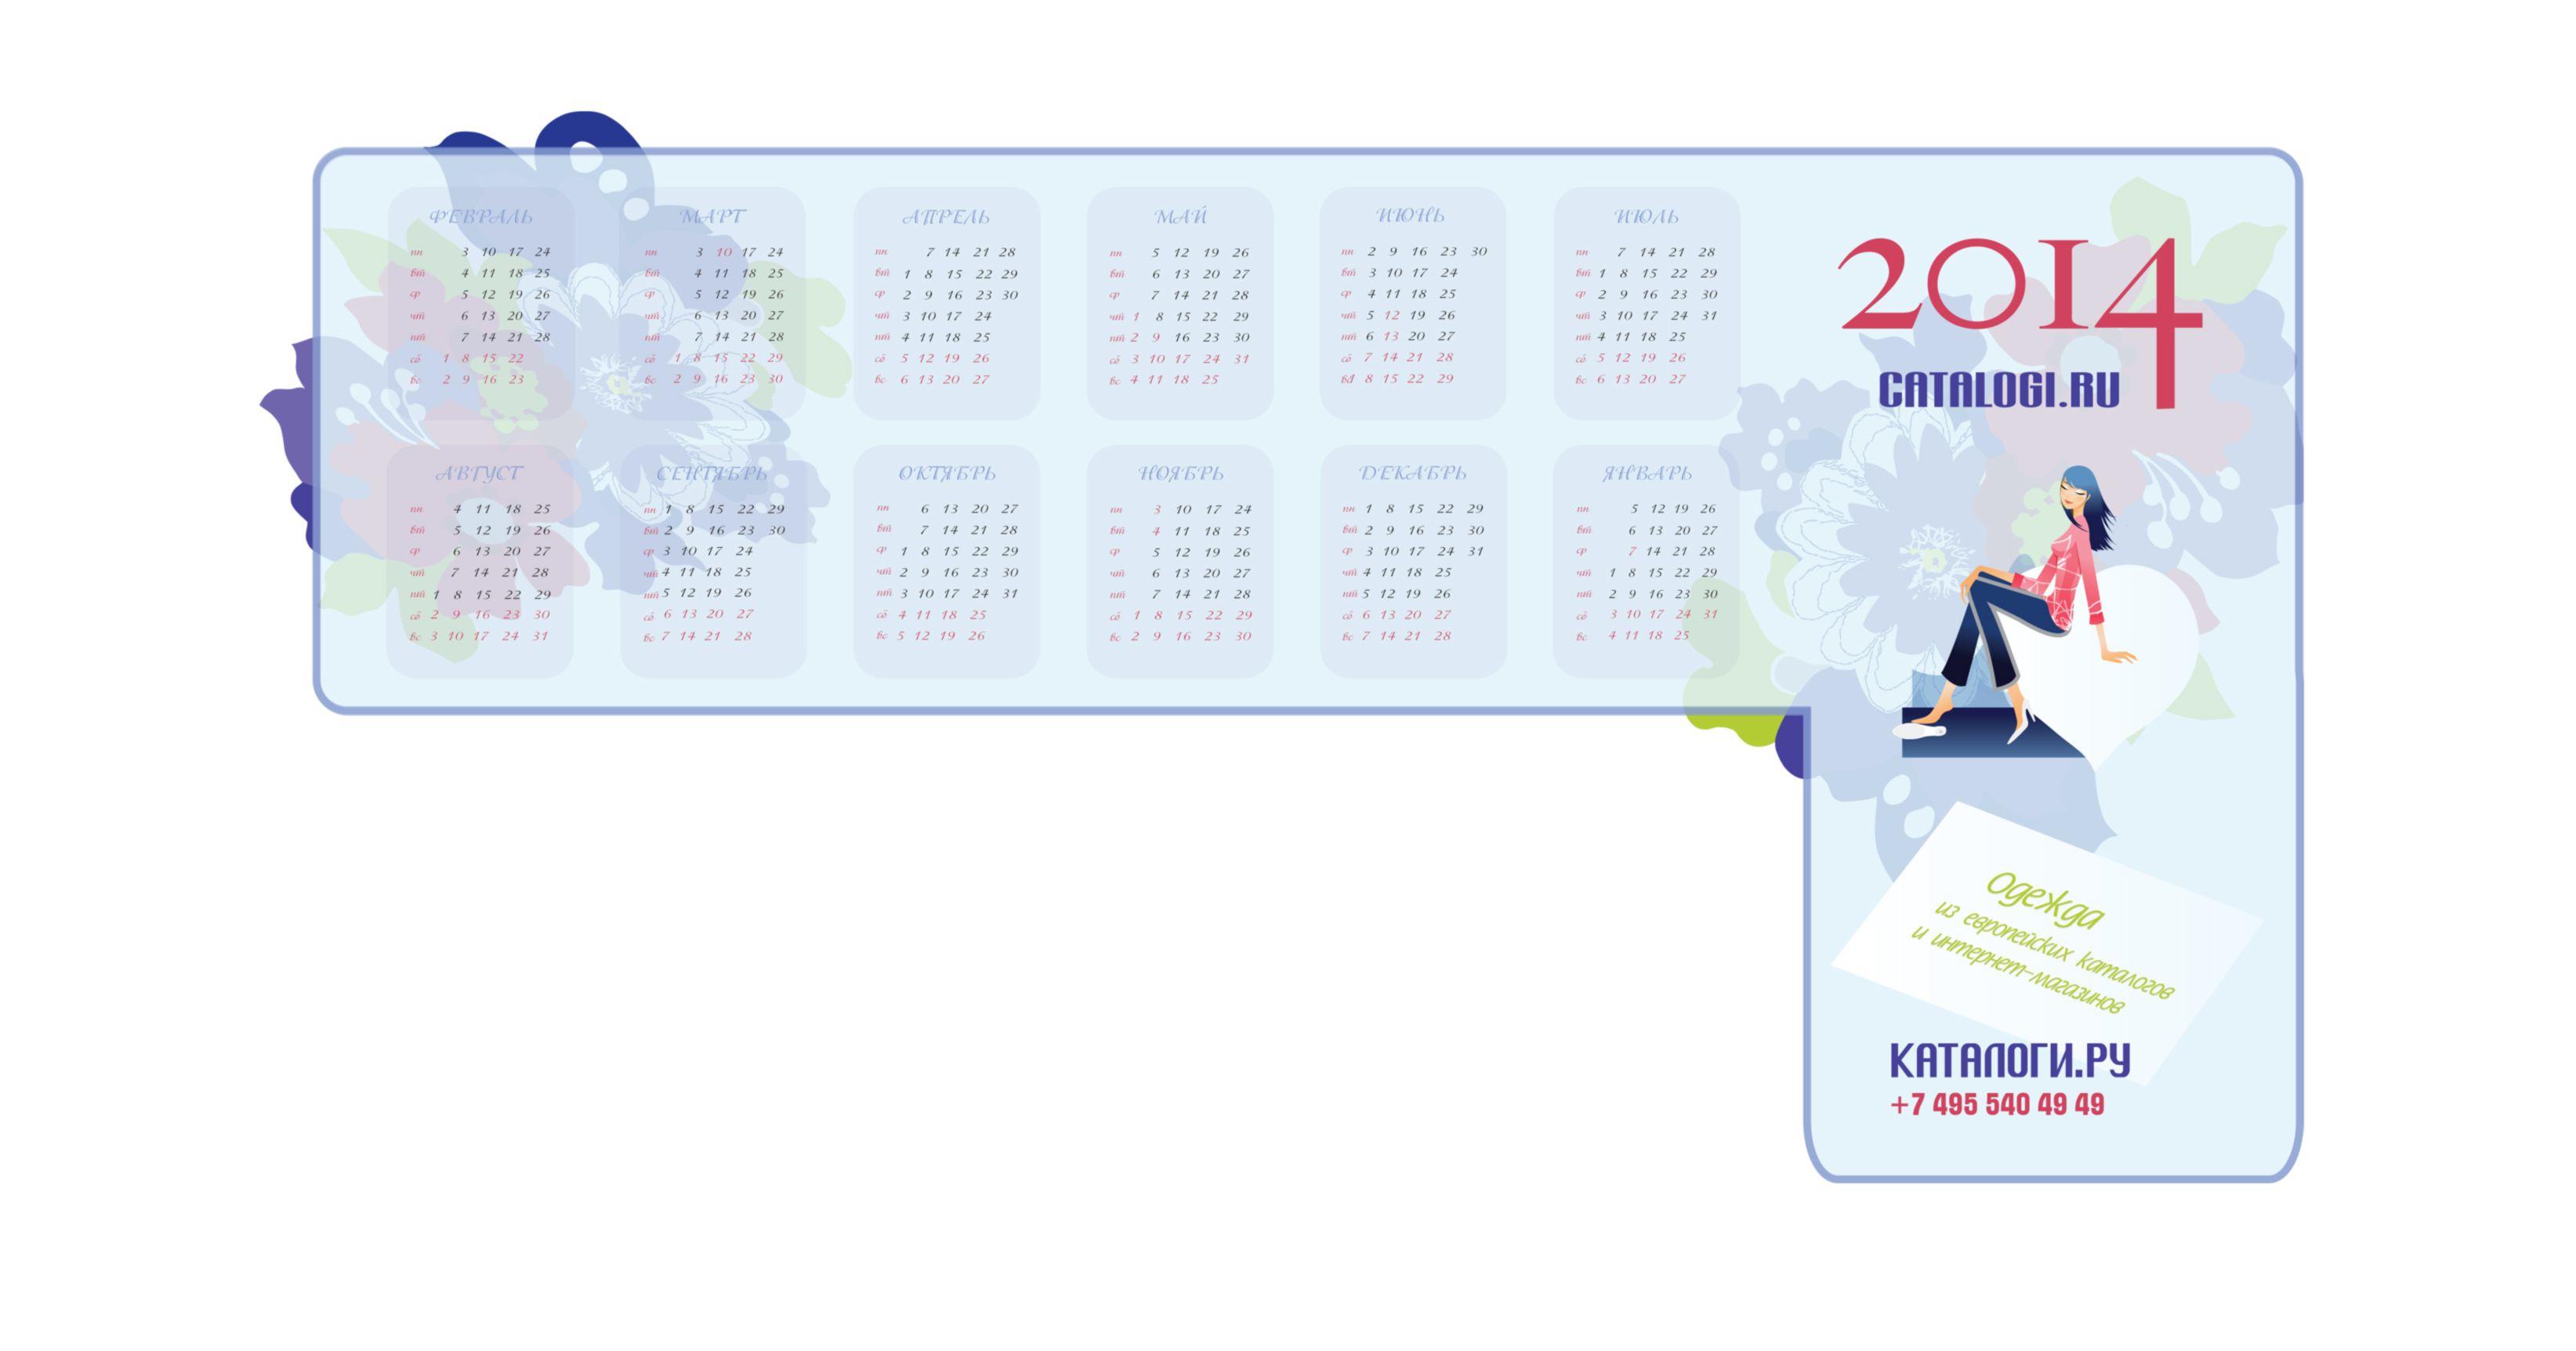 Календарик на монитор Catalogi.ru - дизайнер gallenochka